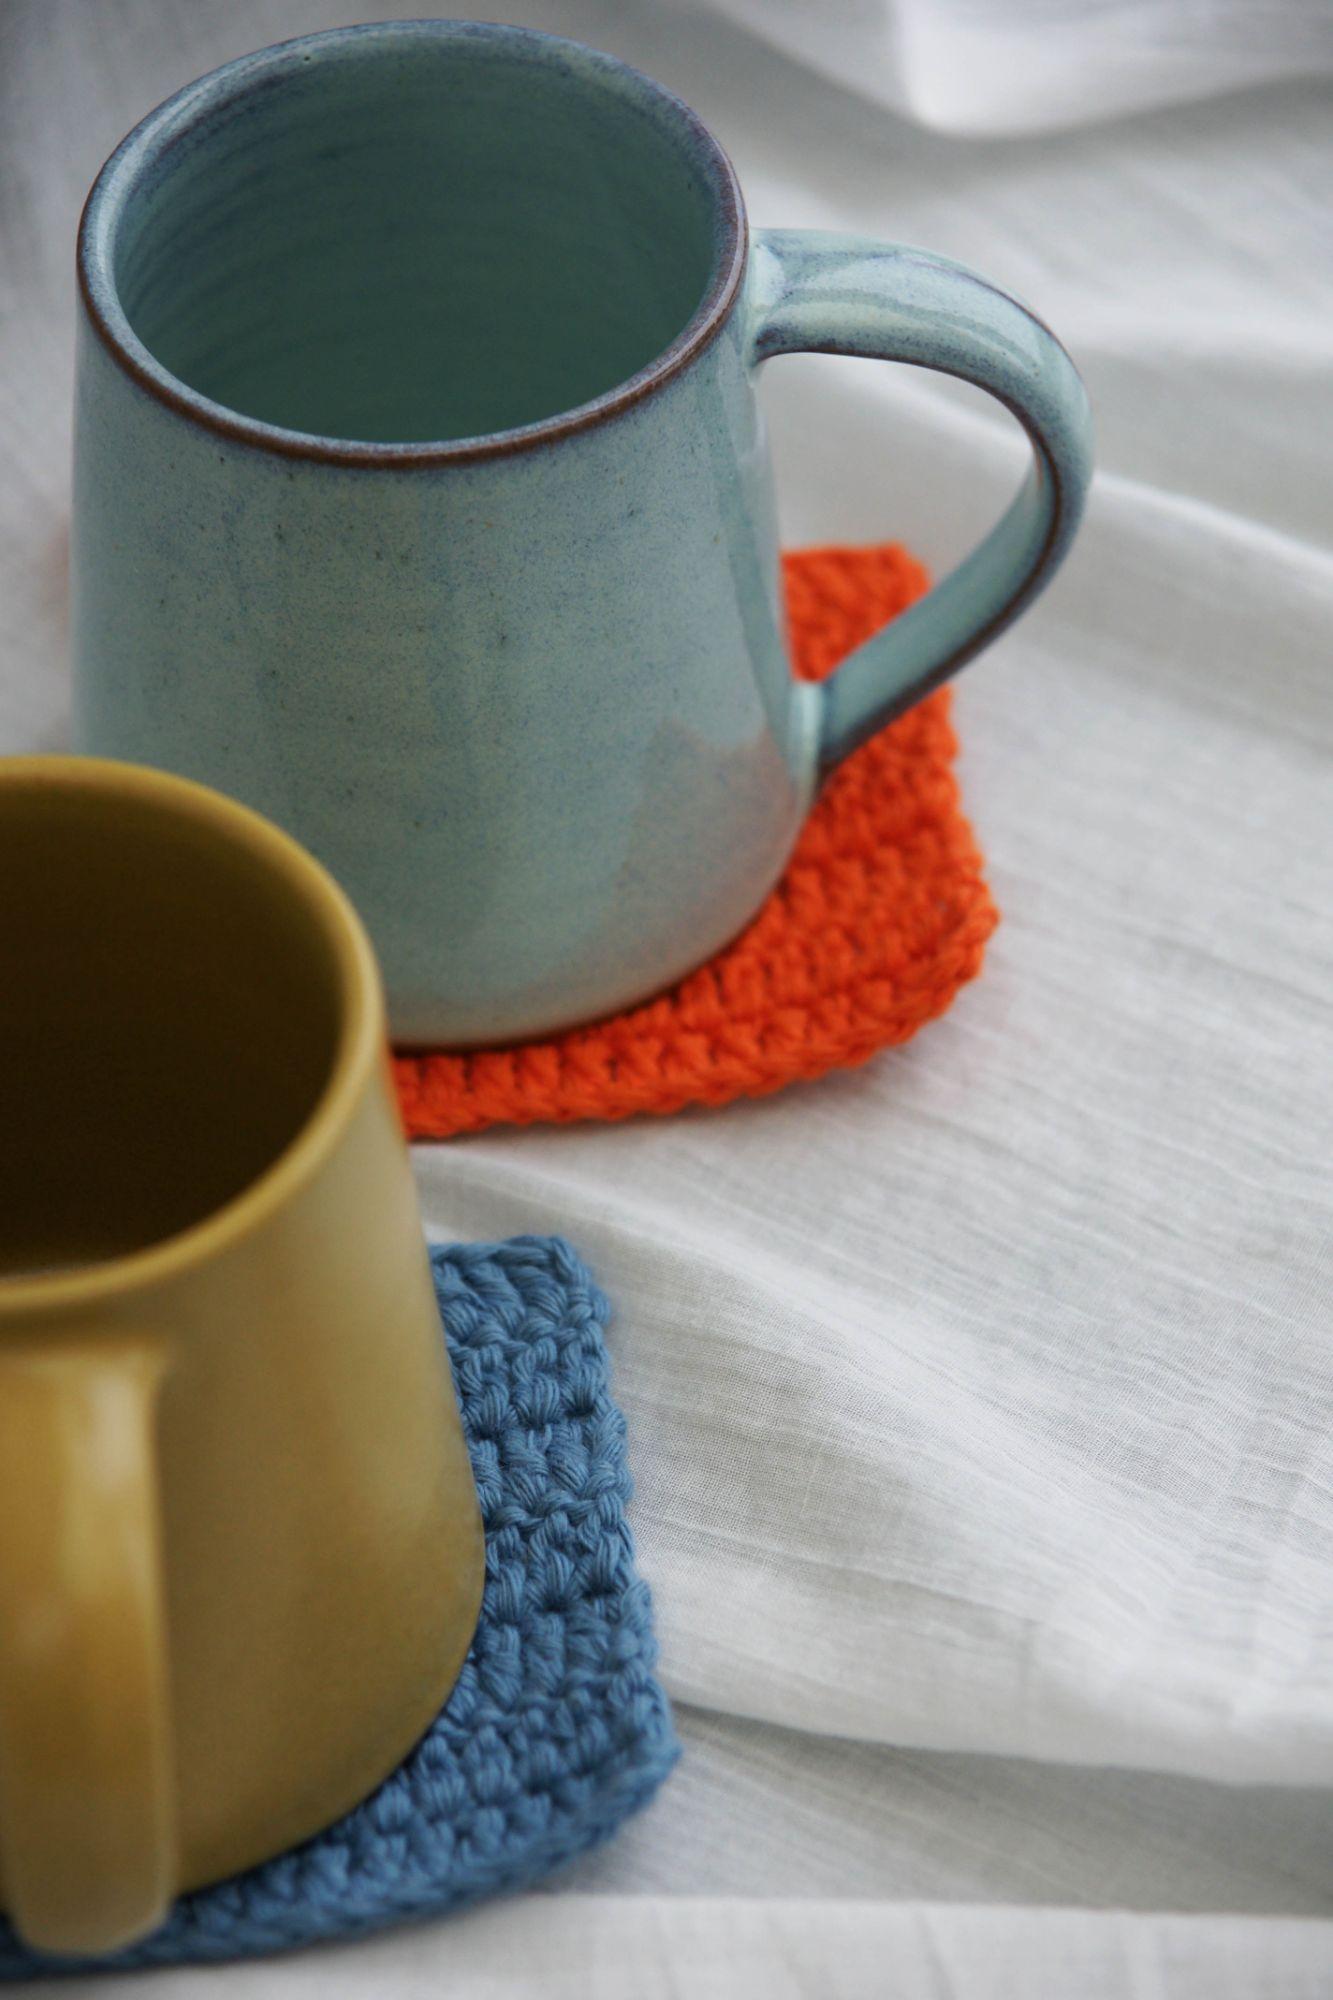 Crochet for Complete Beginners workshop mentored by Kat Neeser